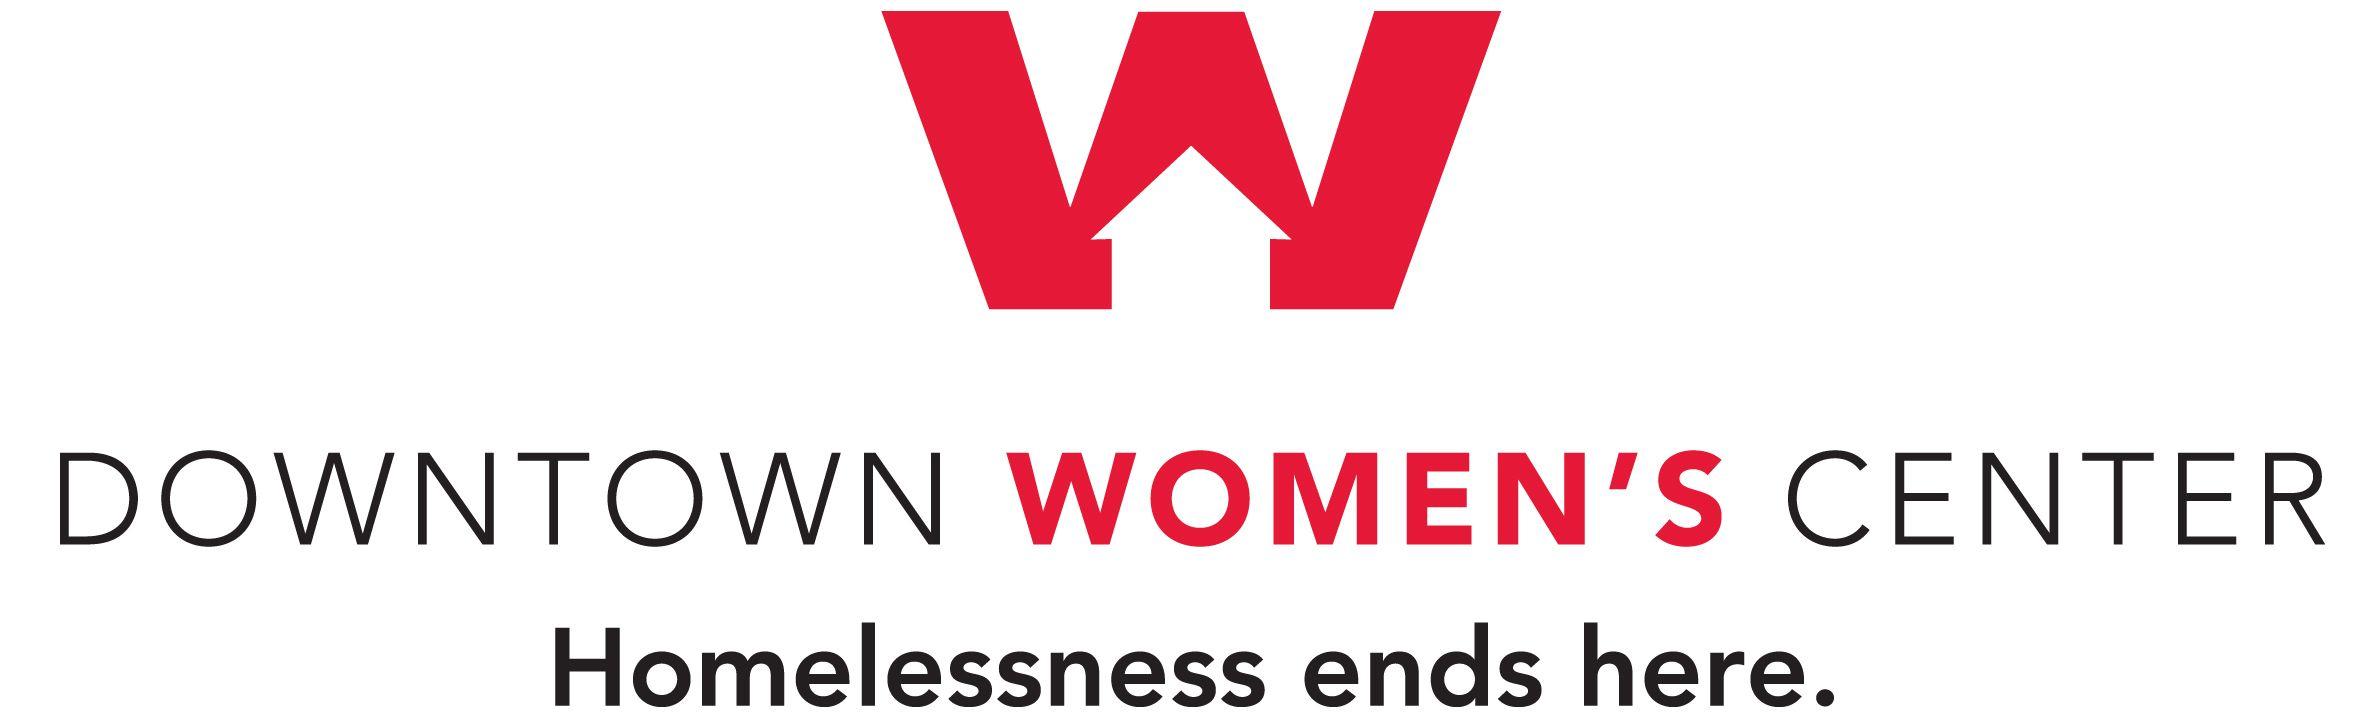 Downtown womens center volunteer